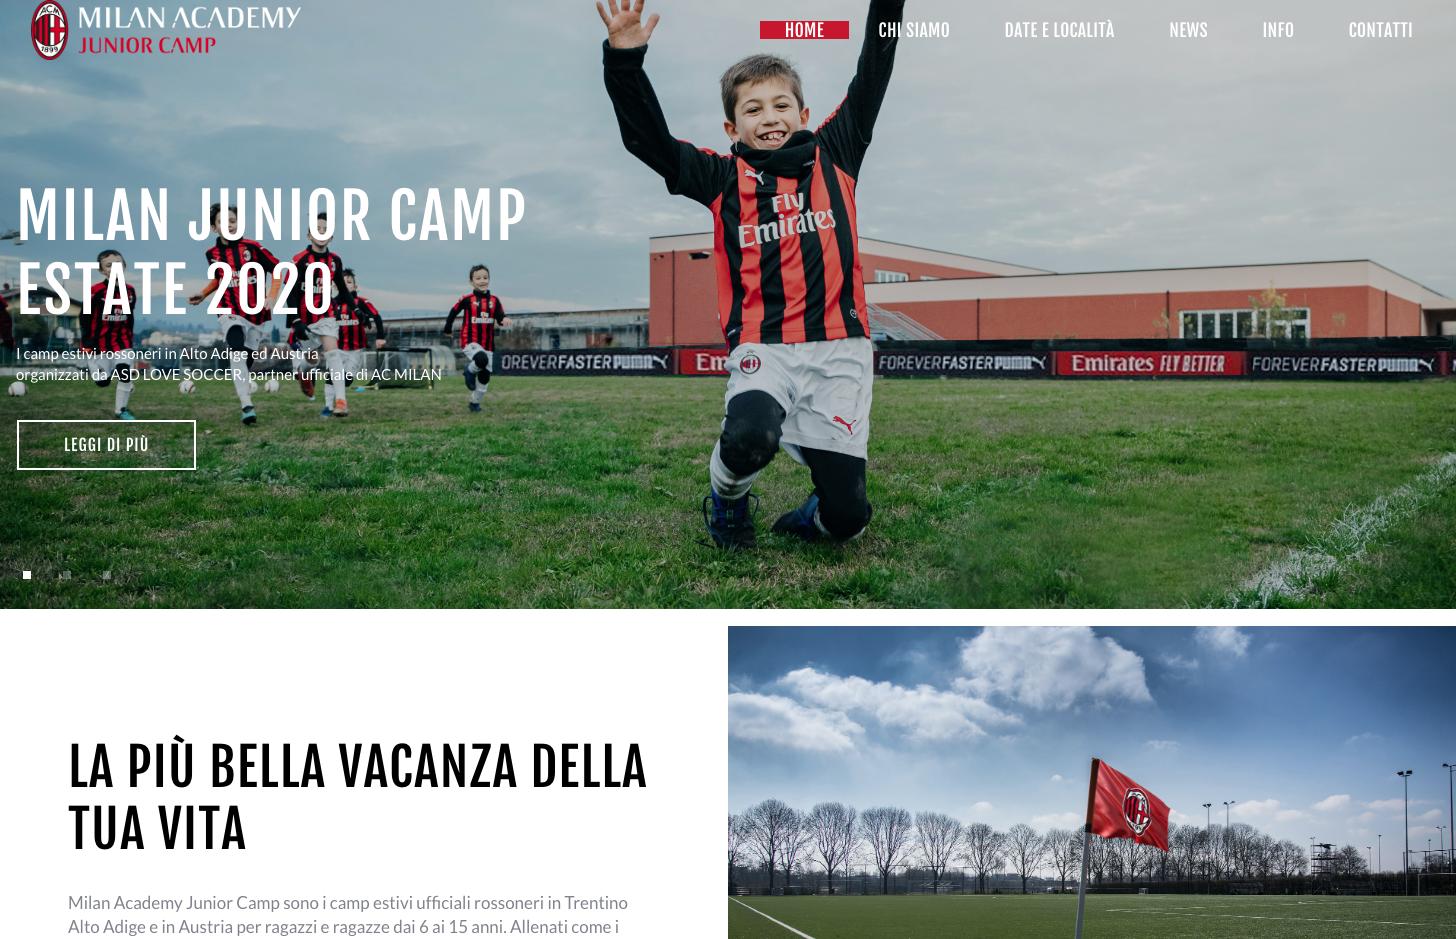 LOVE SOCCER: camp estivi per Milan Academy Junior Camp in Alto Adige